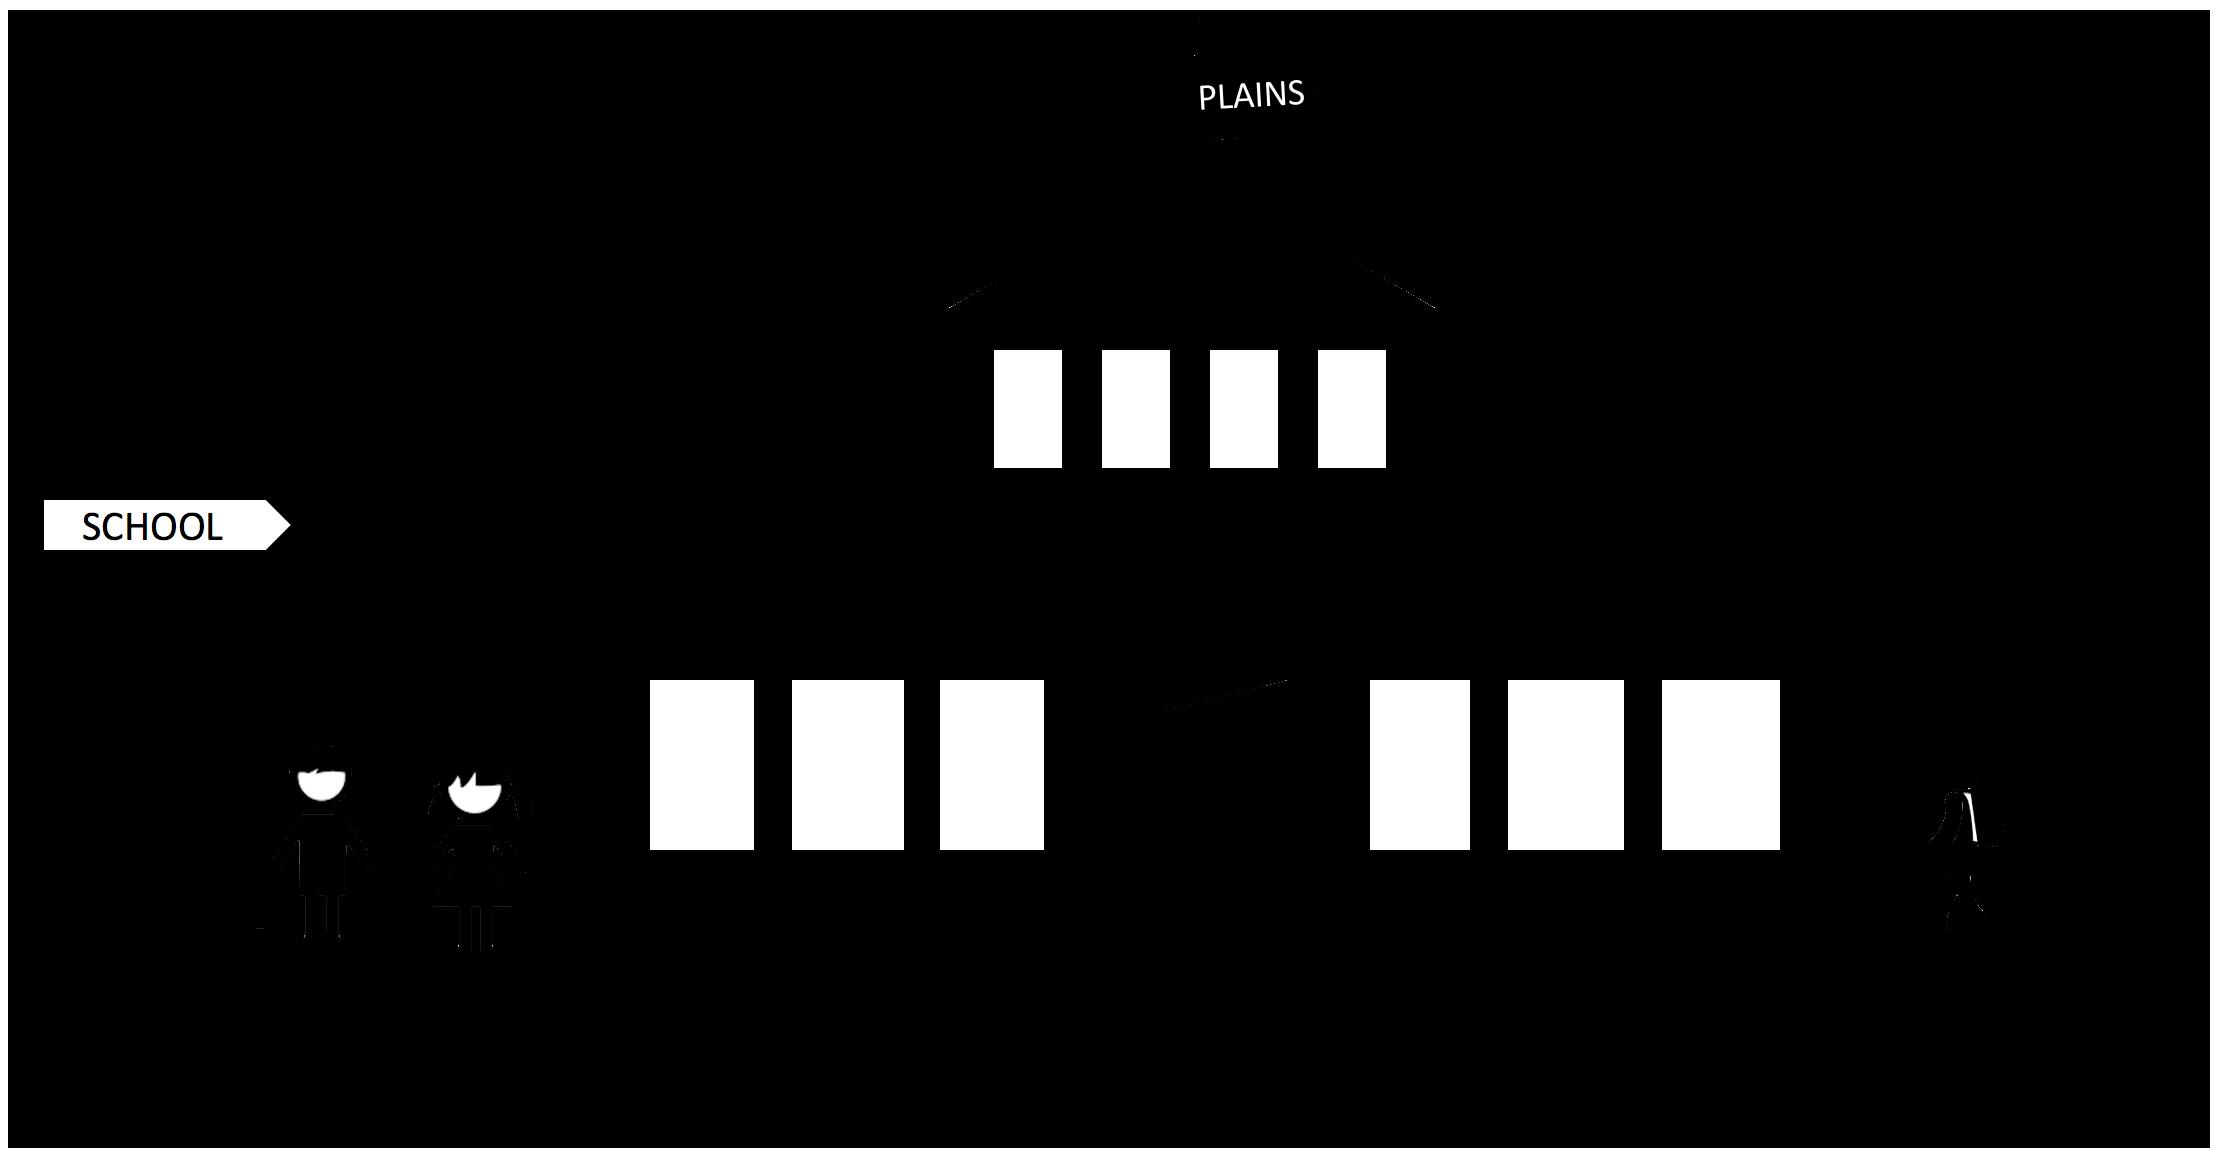 Black and white elementary school clipart jpg free stock Schools - Plains ISD jpg free stock